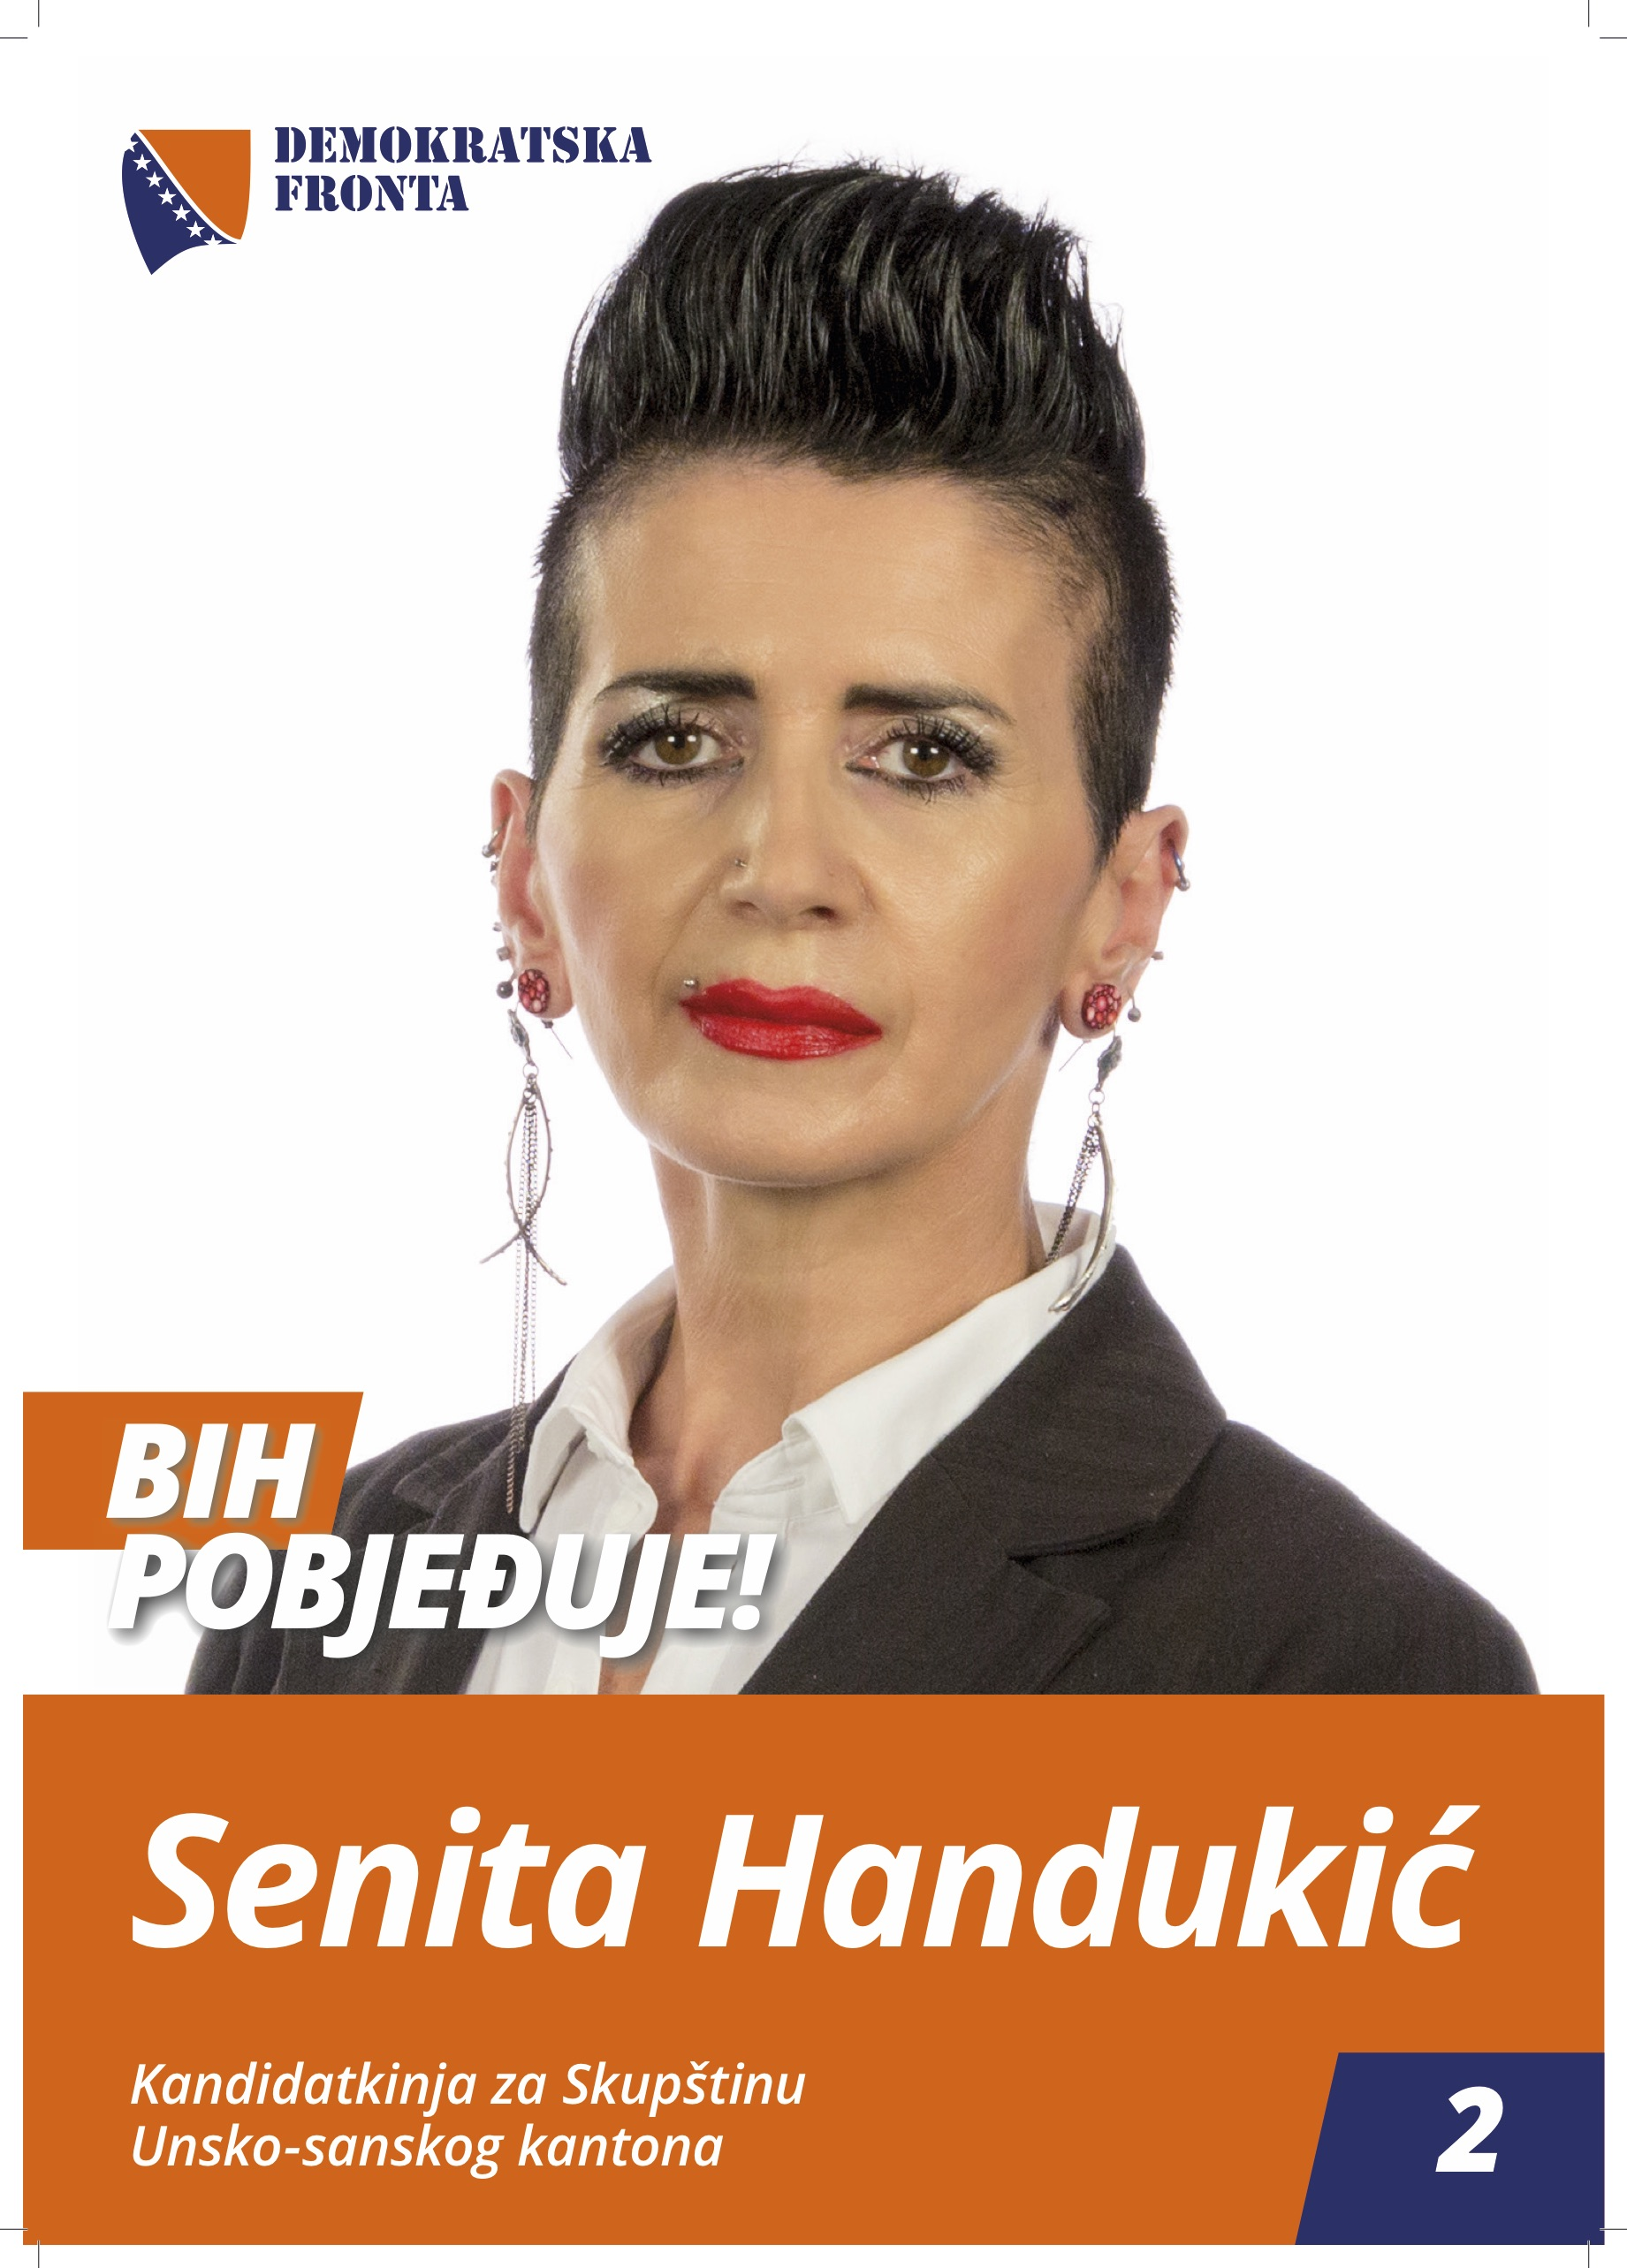 Senita Handukić, programer